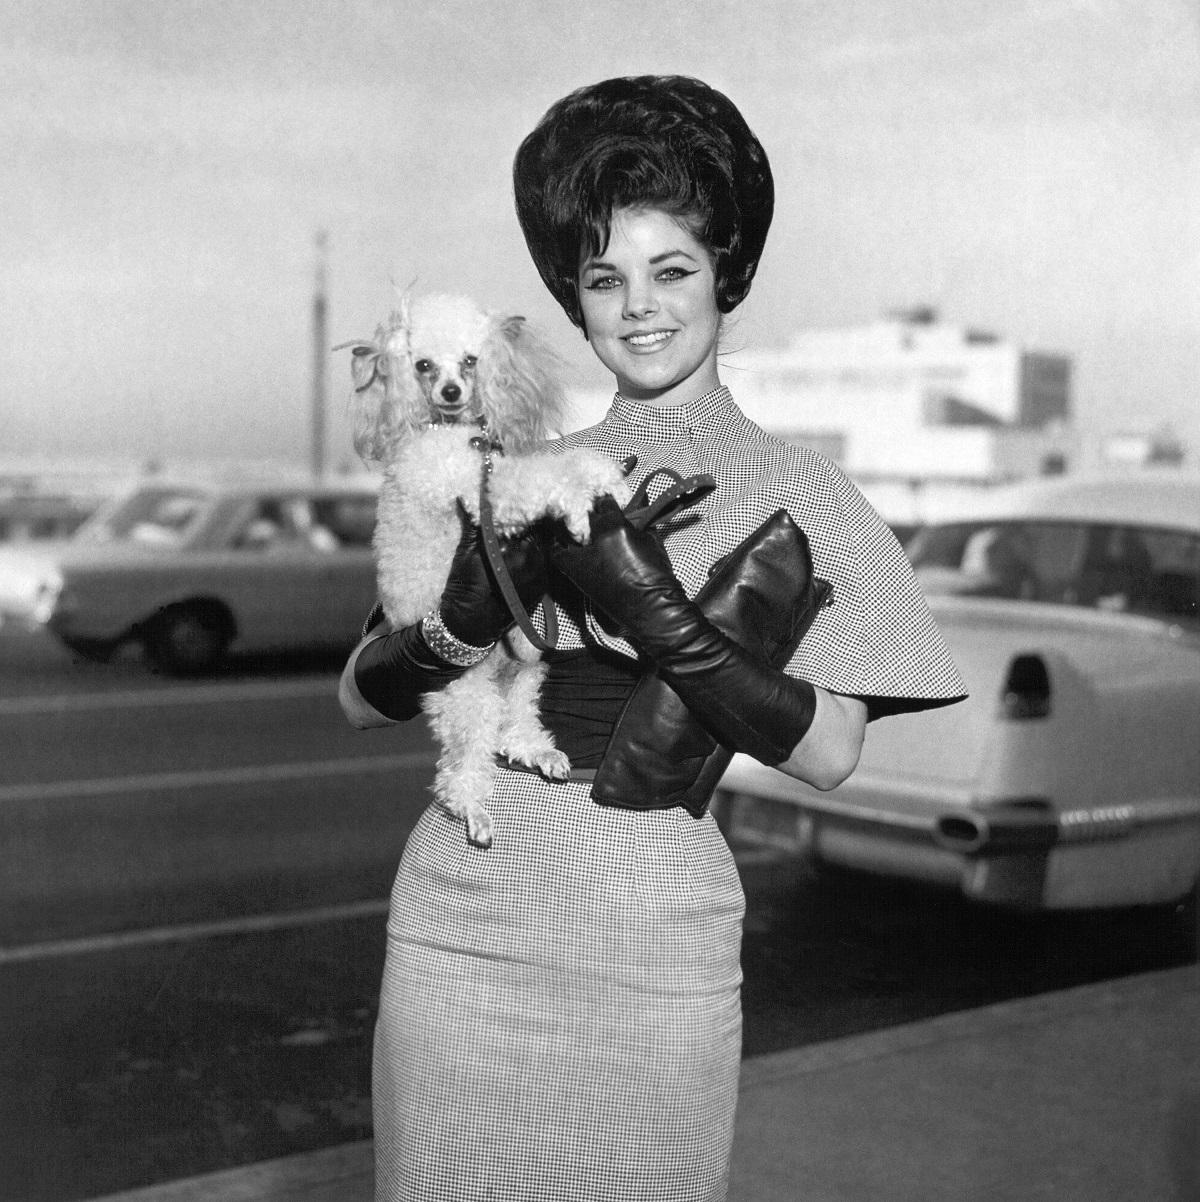 Priscilla Beaulieu Presley in 1963